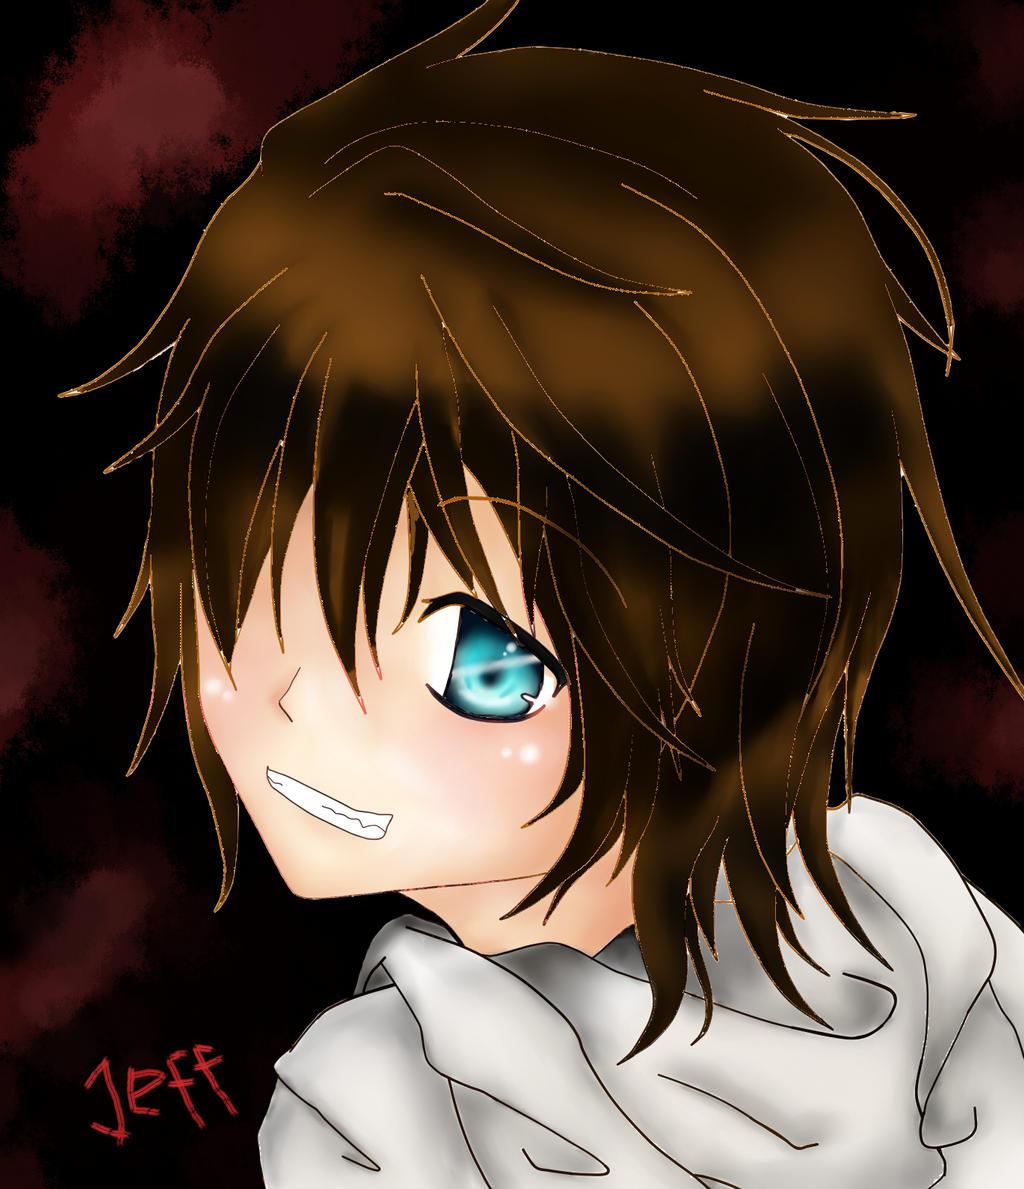 Jeff (non killer) by Ren-Ryuki